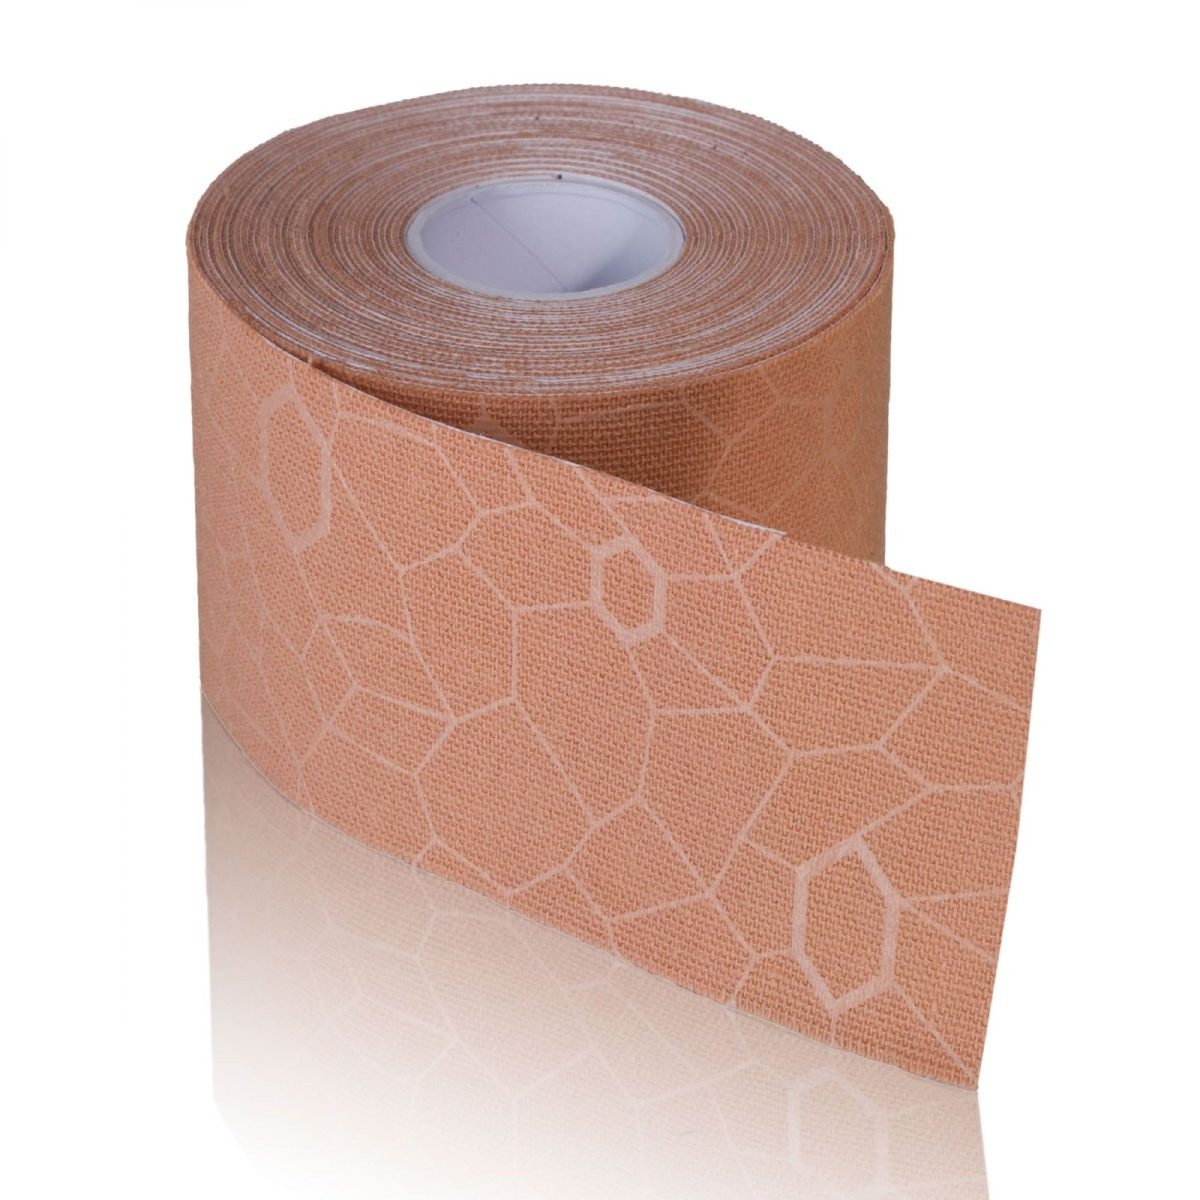 "TheraBand Kinesiology Tape, 2"" x 16.4', Beige/Beige, Roll"